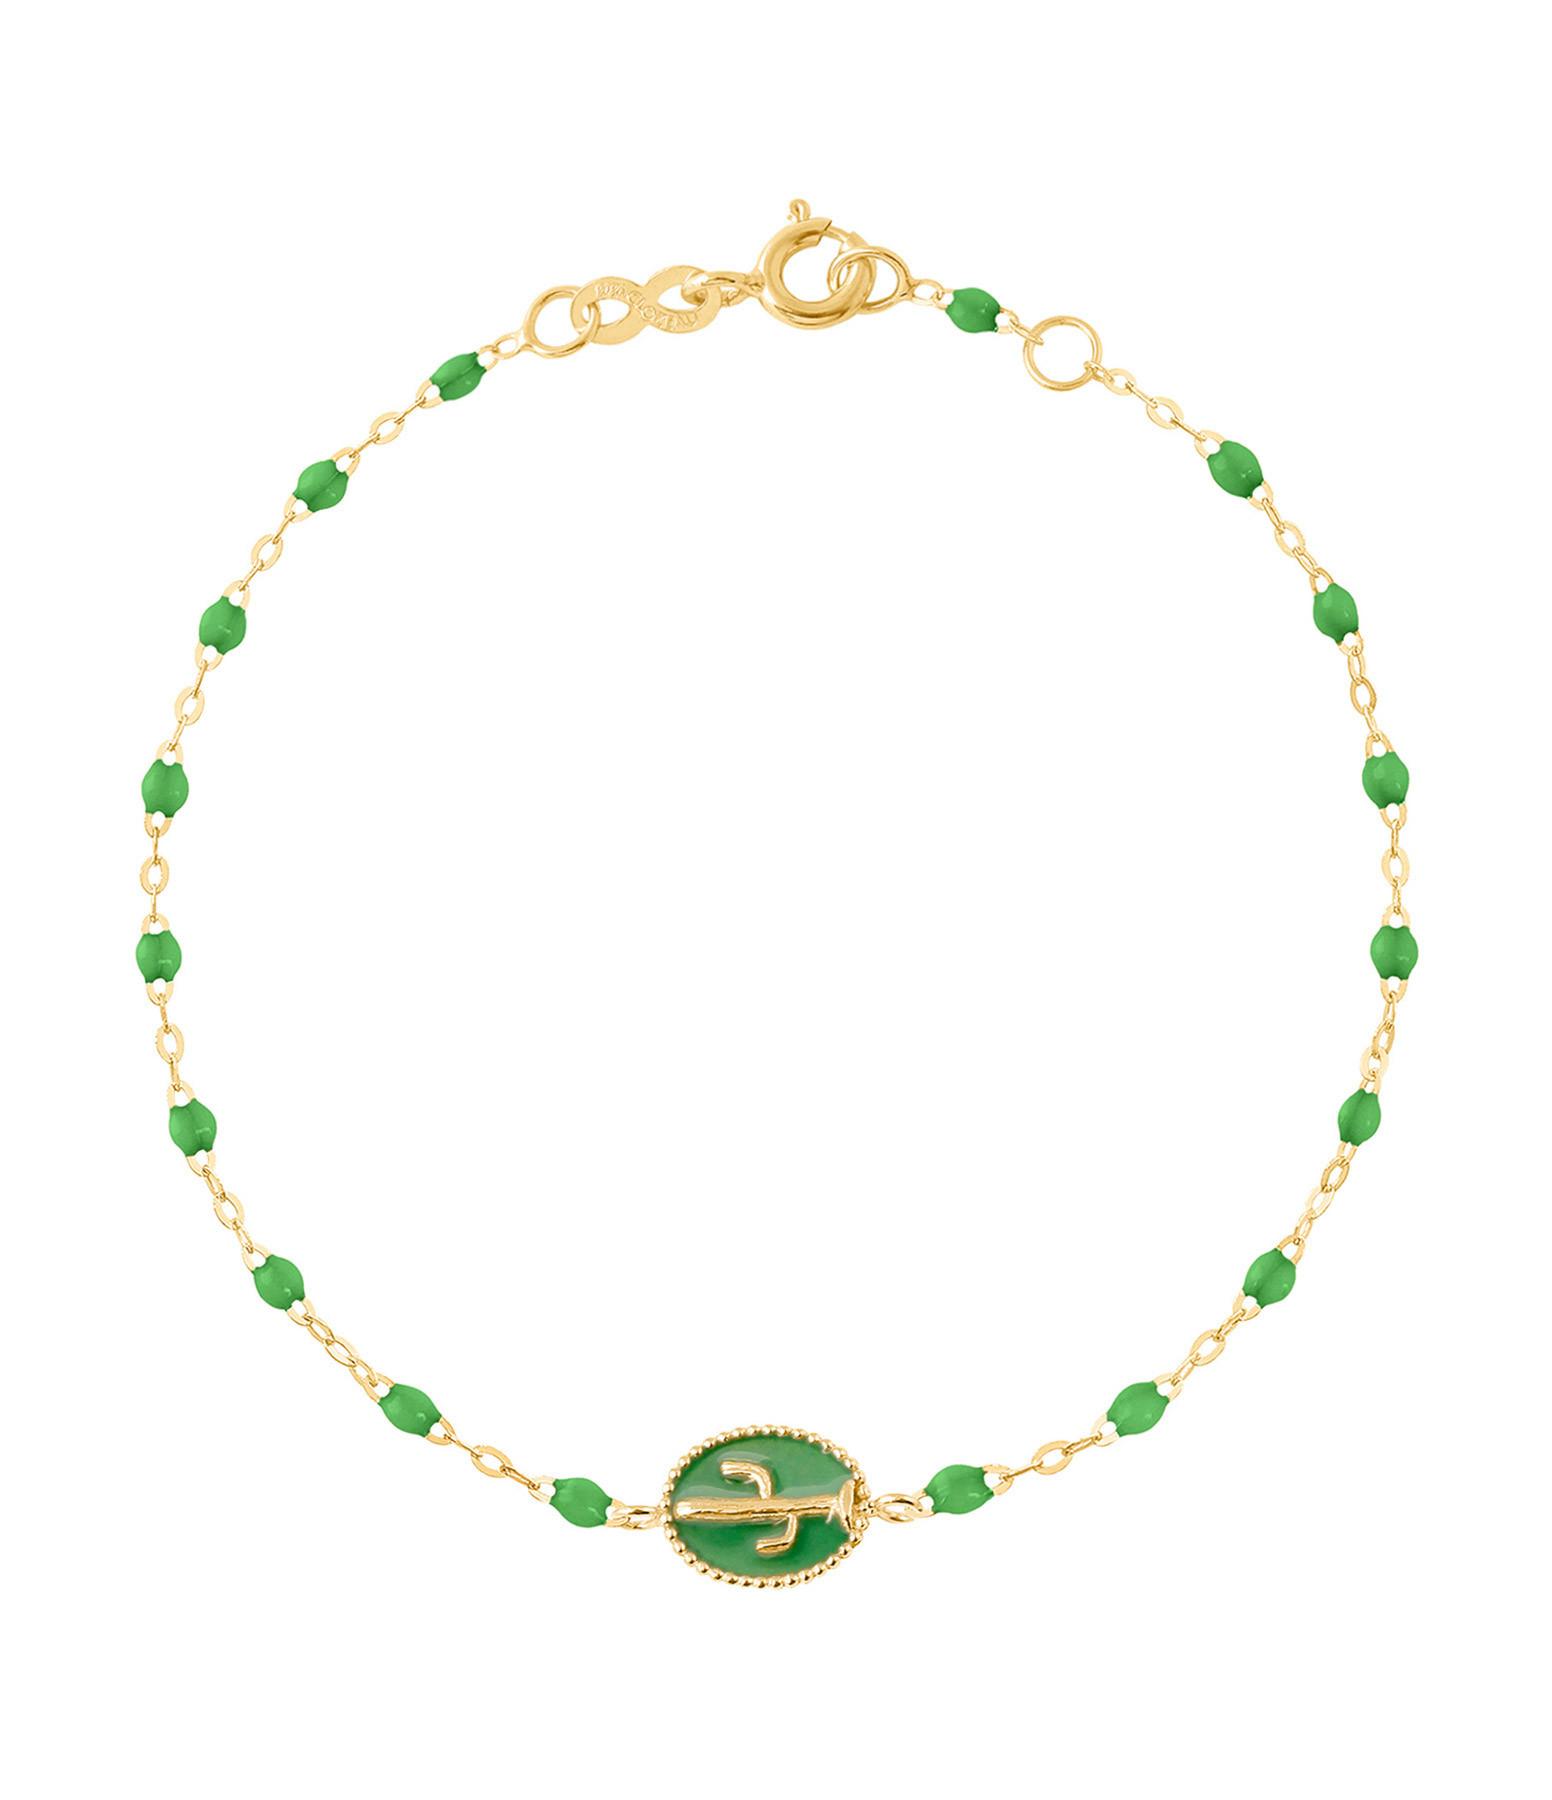 GIGI CLOZEAU - Bracelet Perles Résine Cactus OJ Vert Prairie